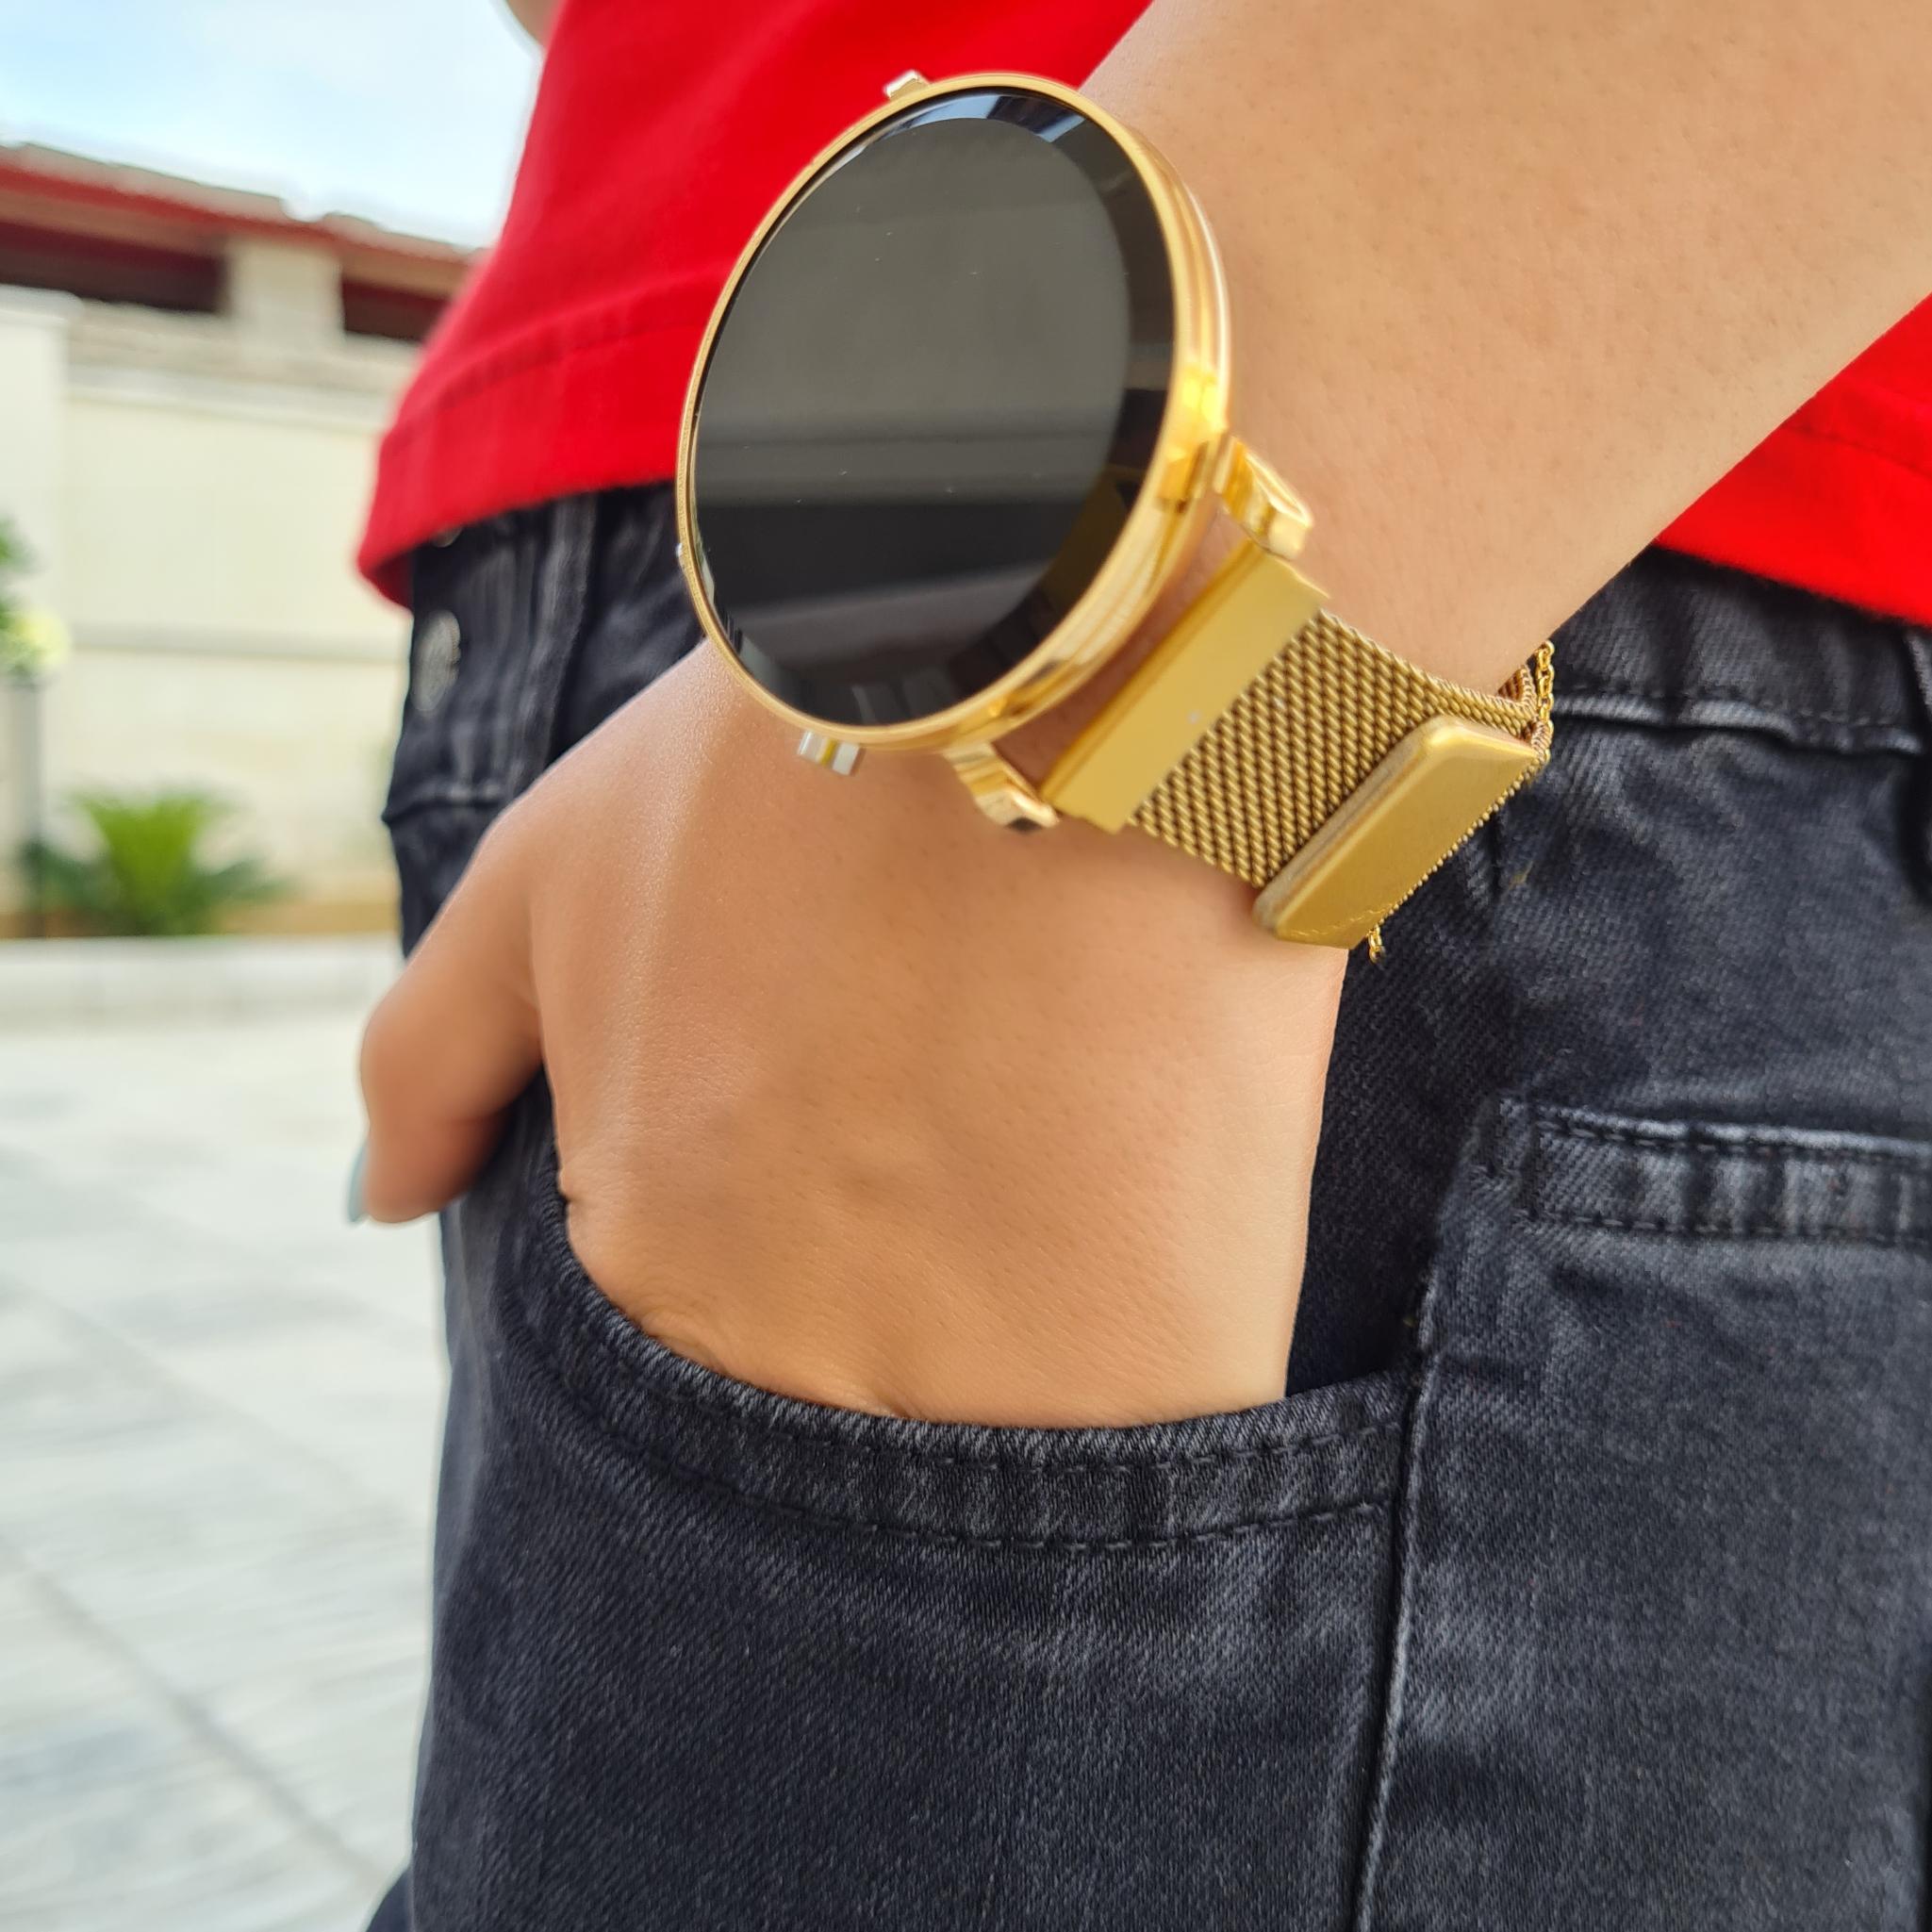 ساعت مچی دیجیتال مدل هوشمند کد 02